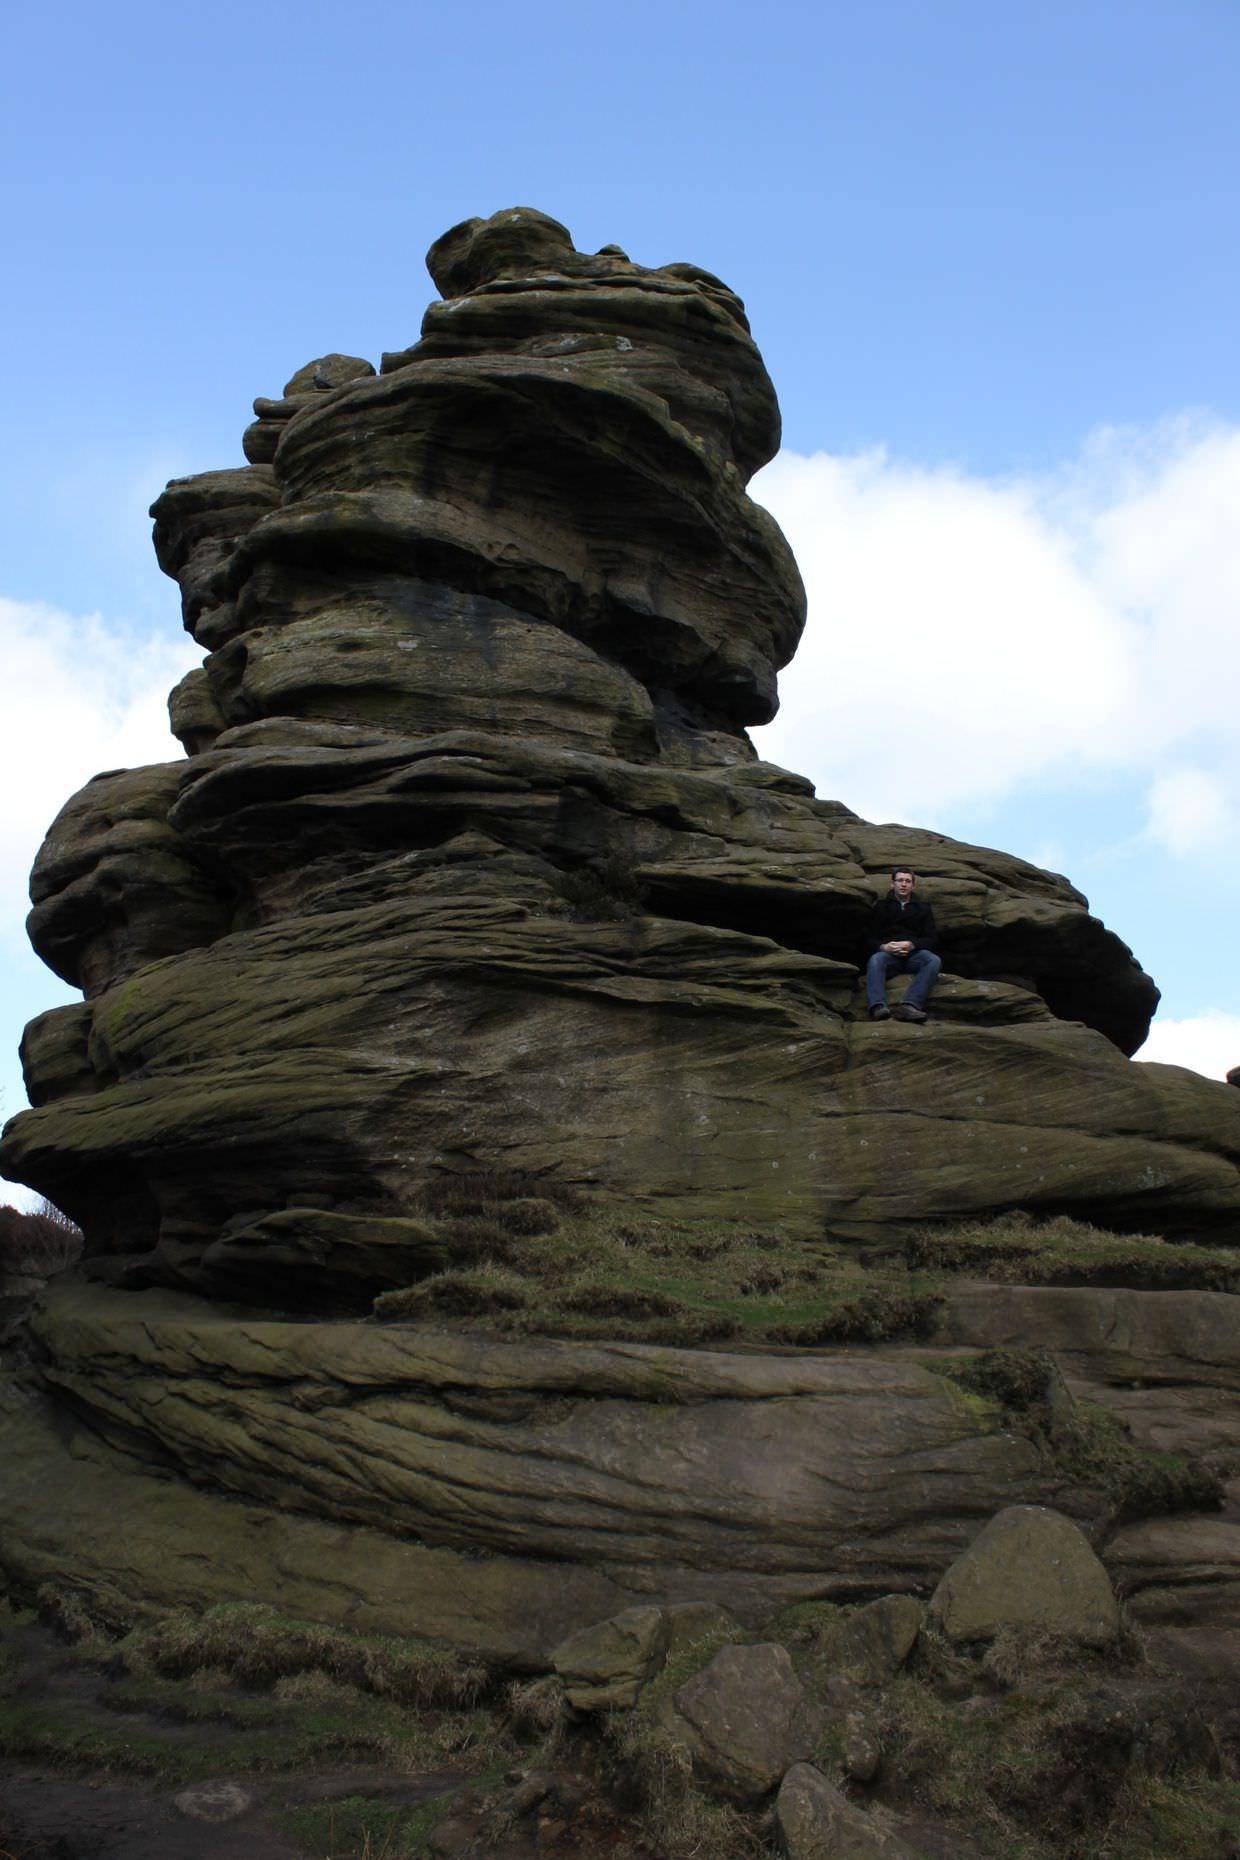 Novice bouldering